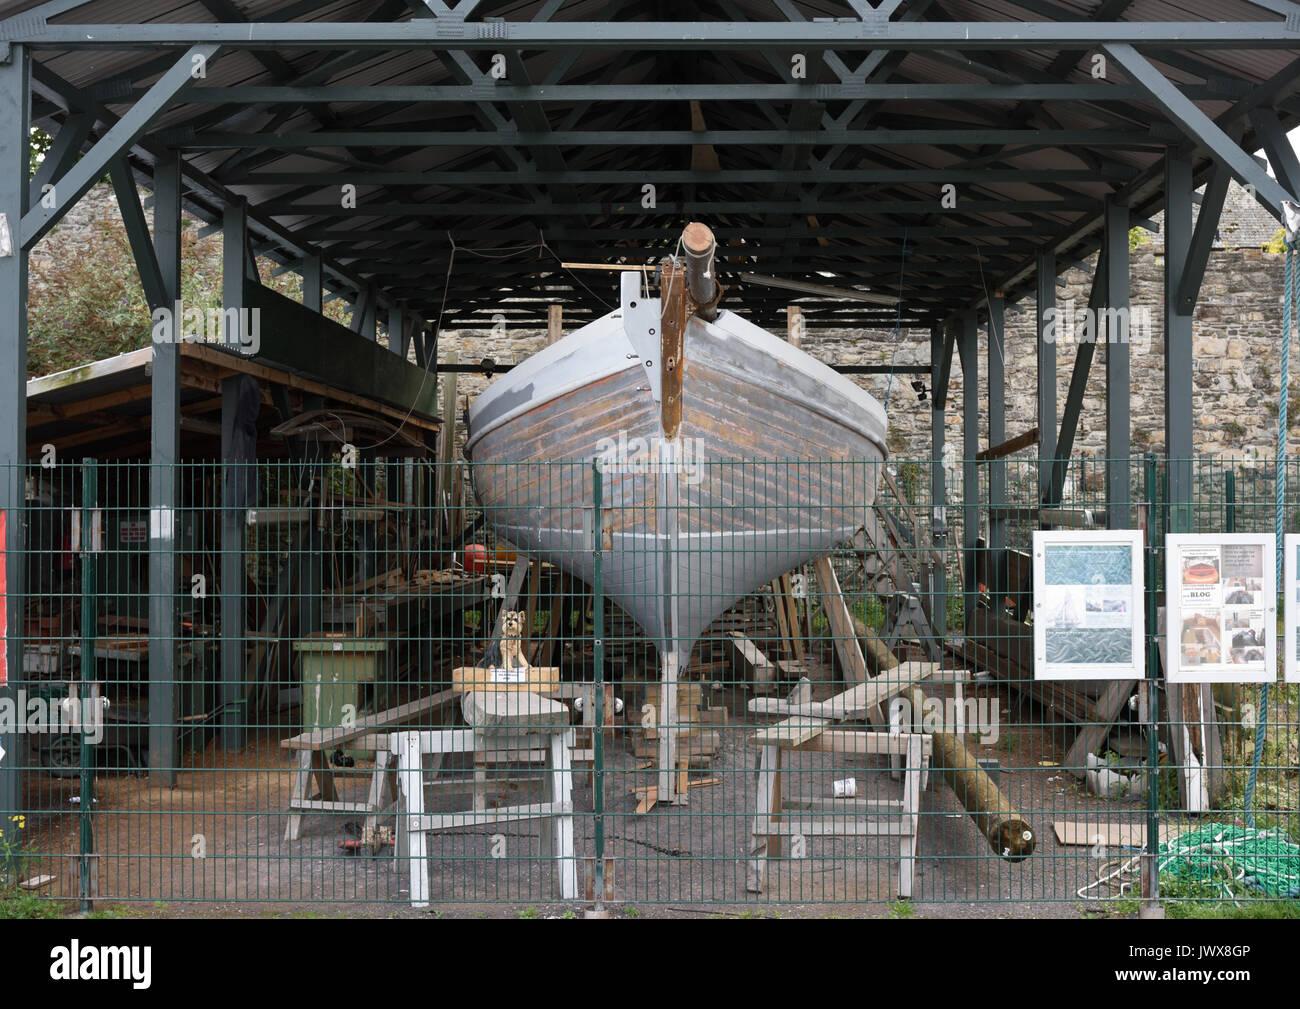 Nobby helen 11 wooden boat under restoration - Stock Image